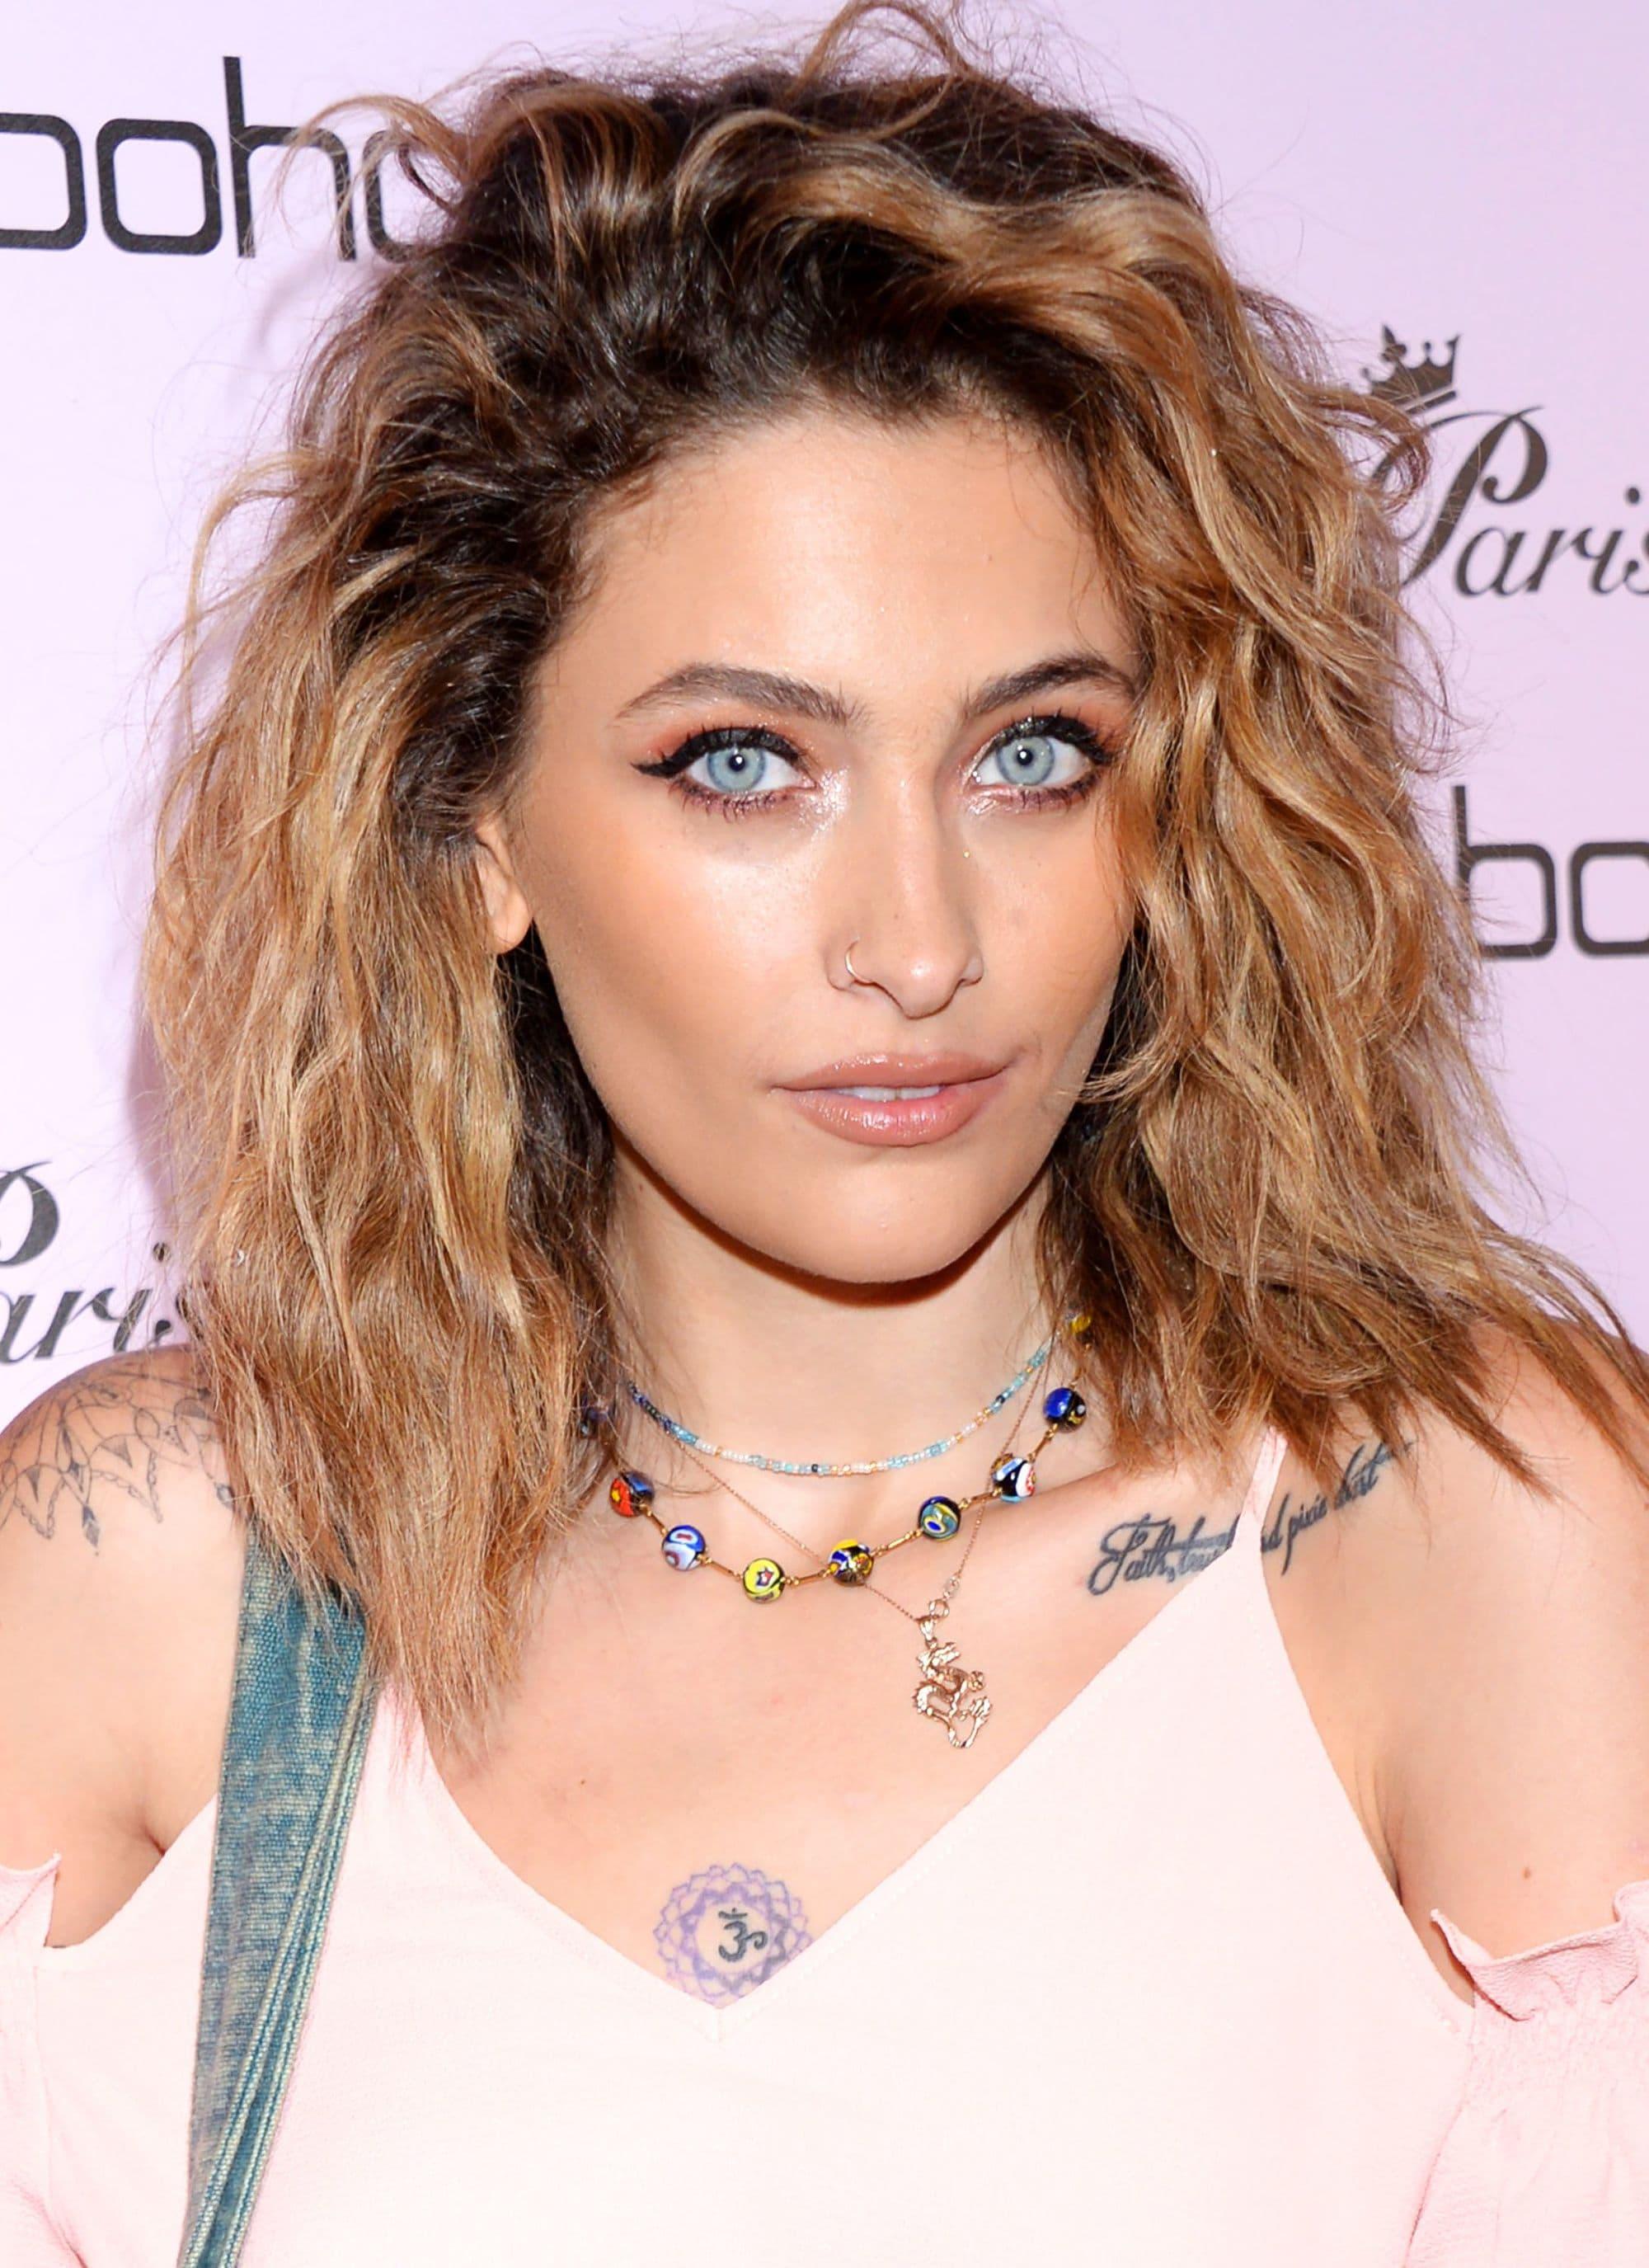 Medium hairstyles for thick hair: Paris Jackson with light warm brown hair in a mid-length layered shag cut